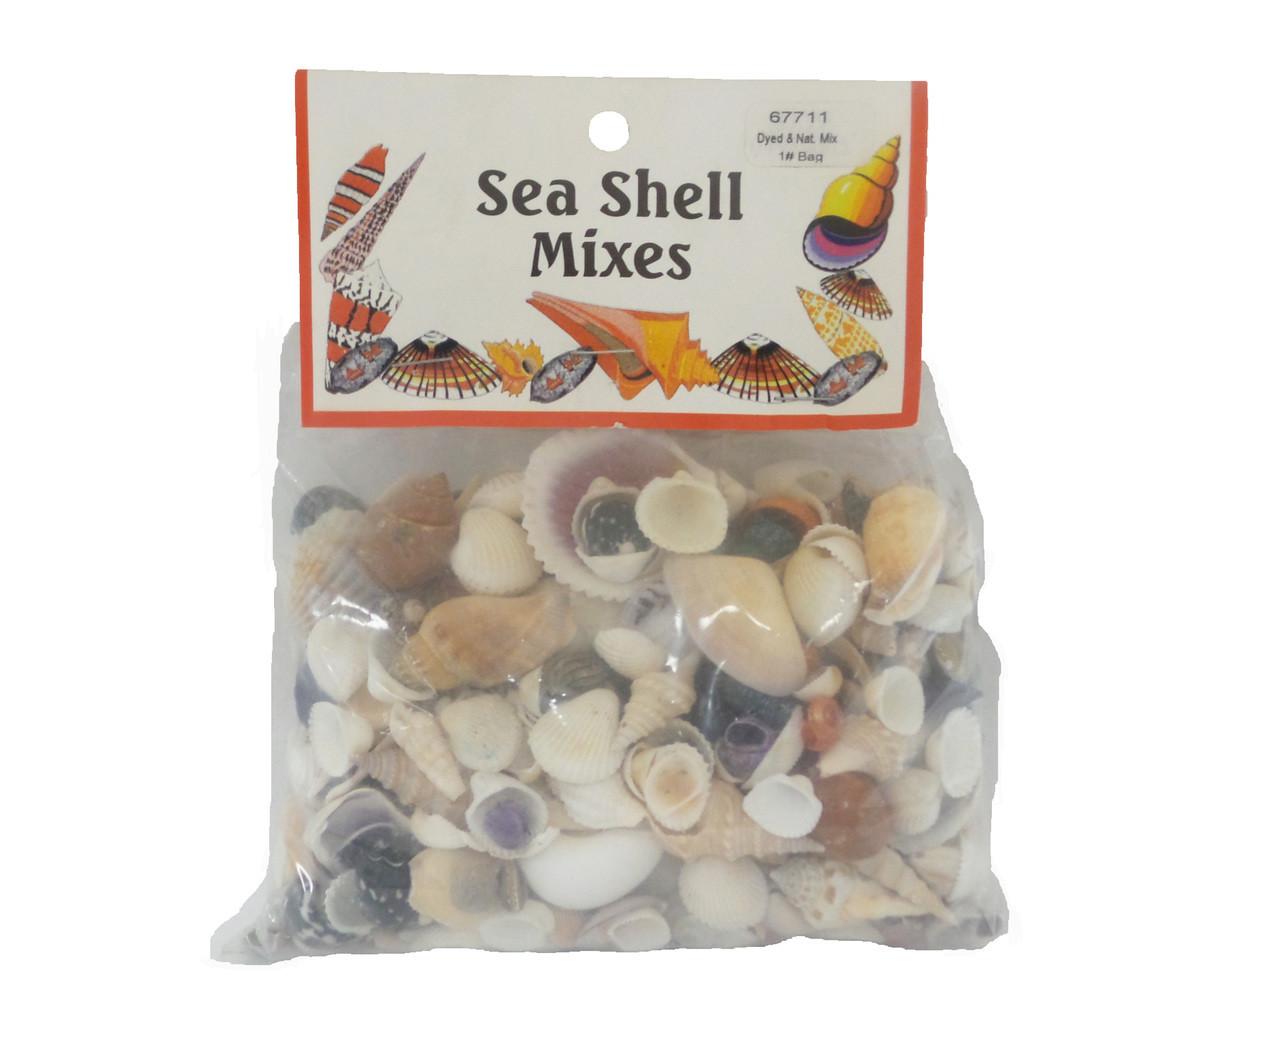 Dyed and Natural Mix Seashells